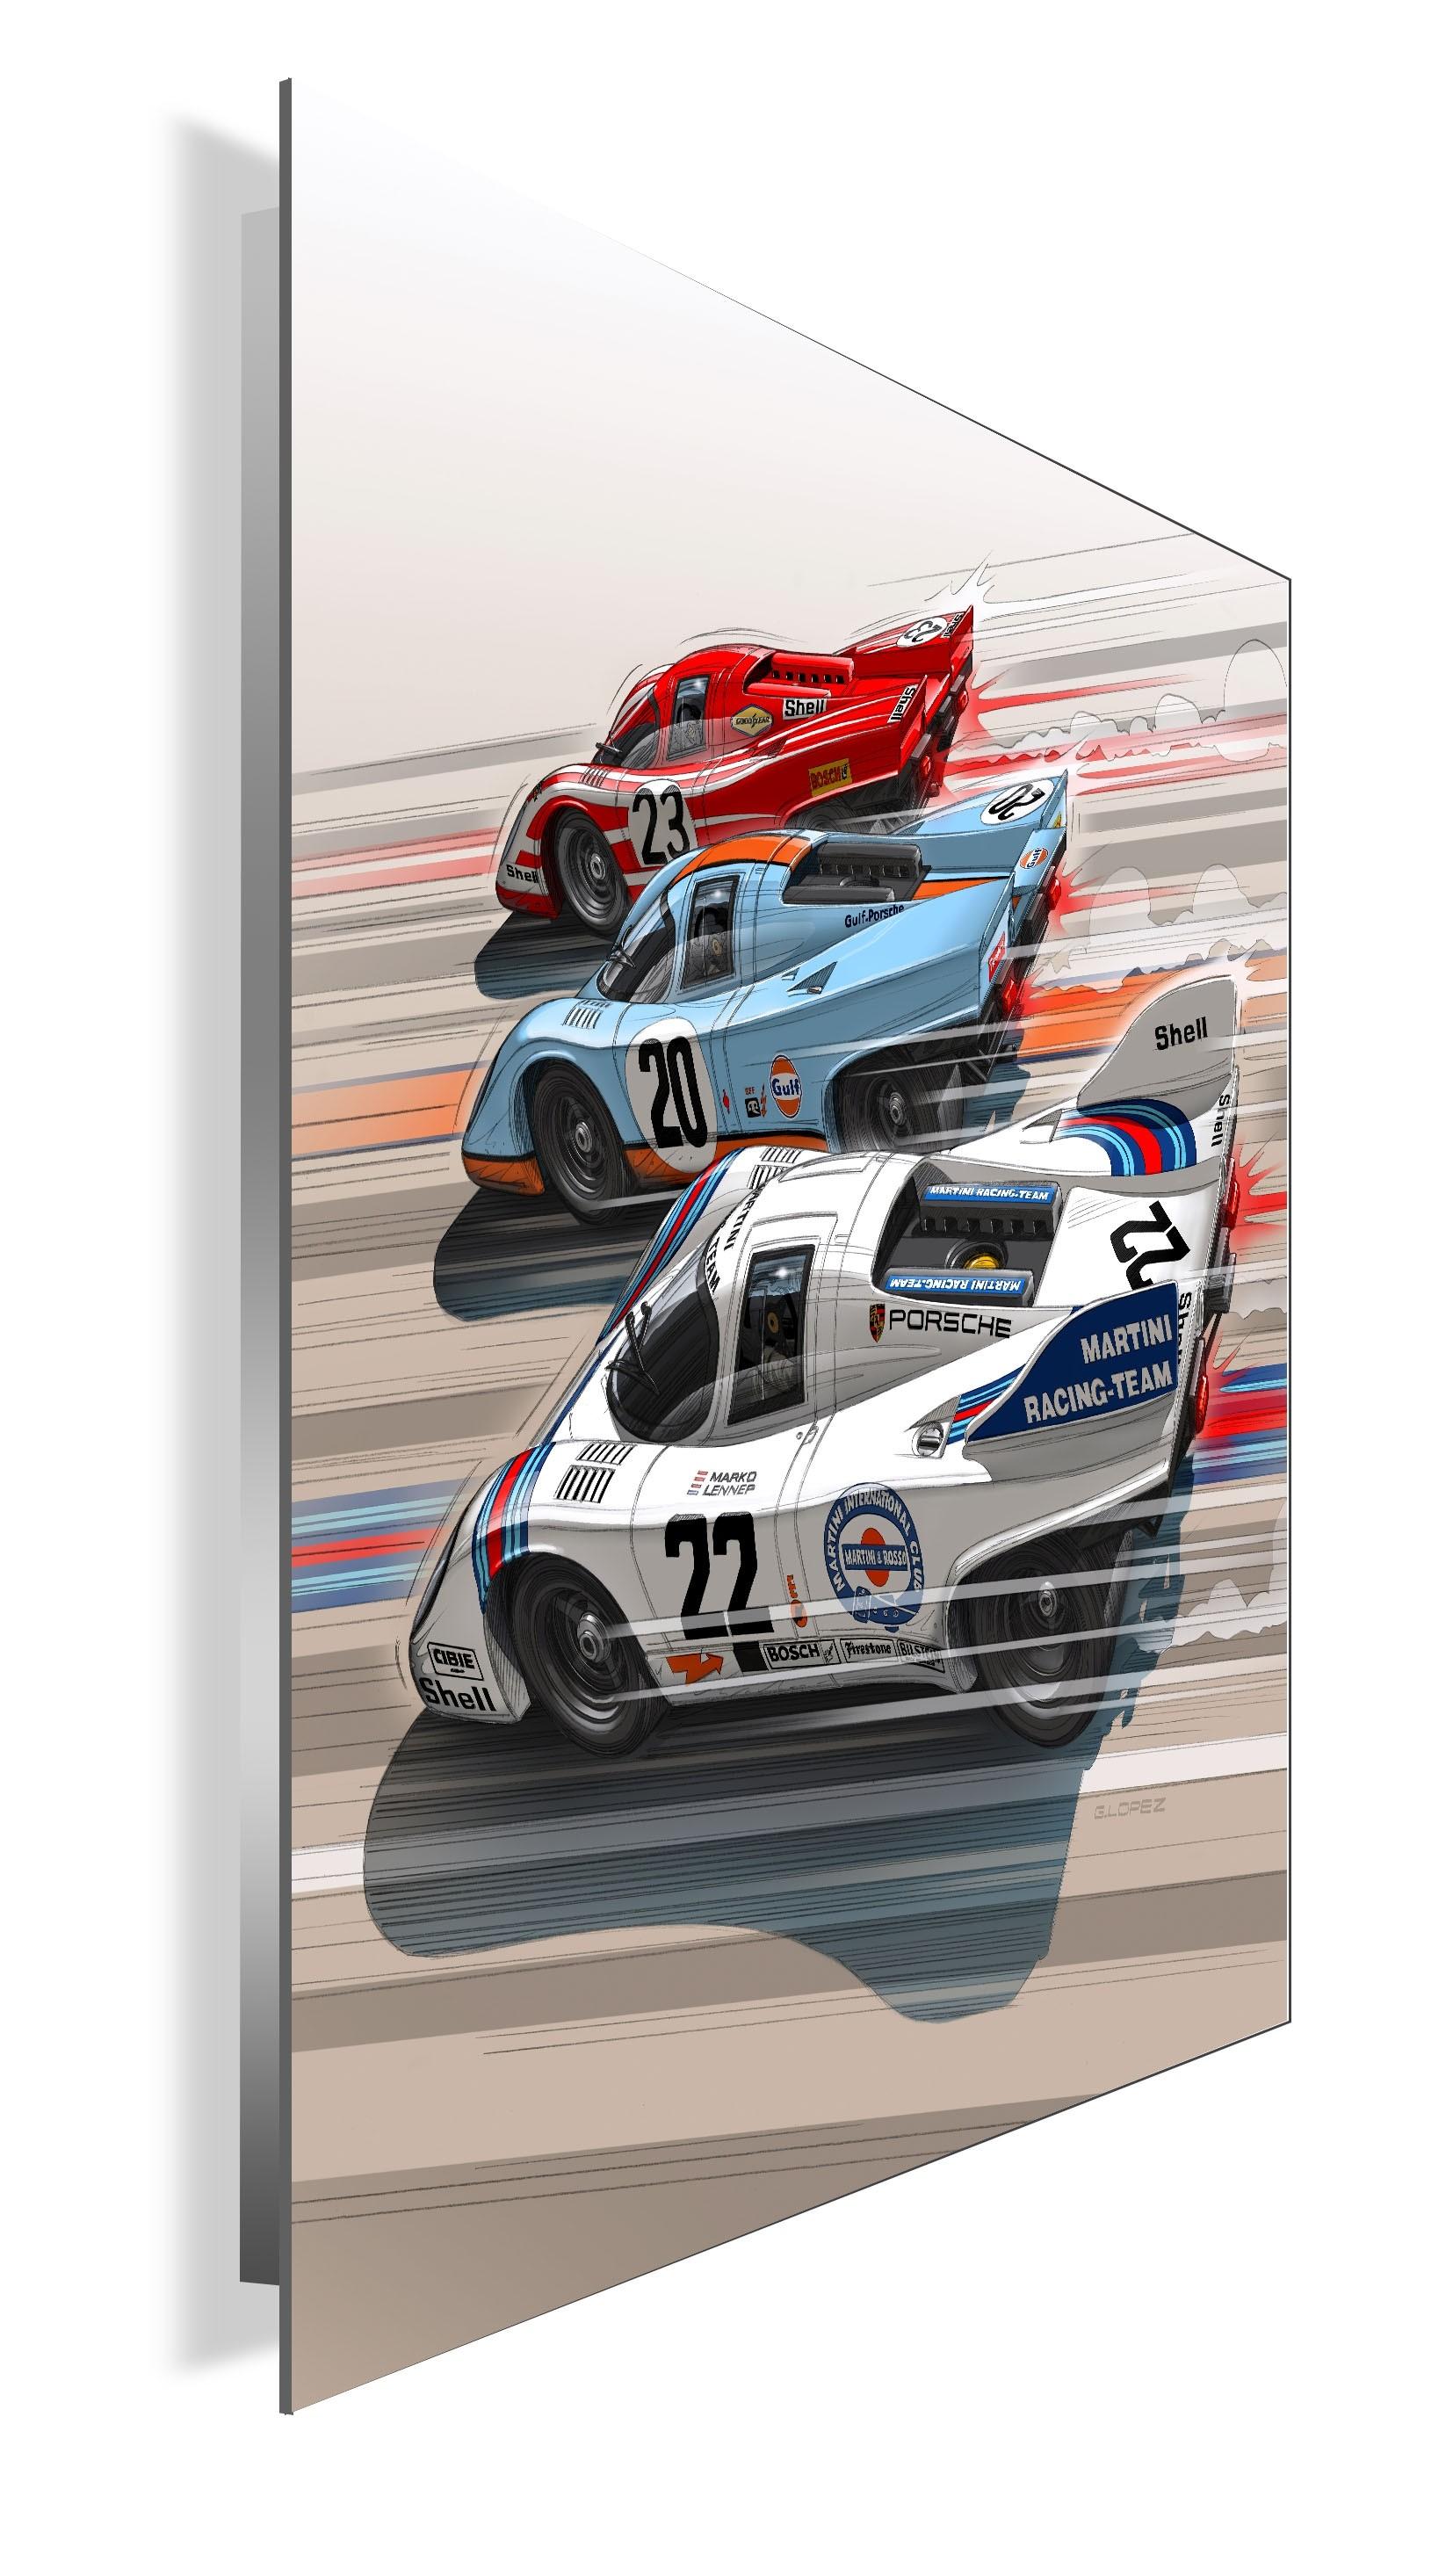 Edition limitée 917 TRIO